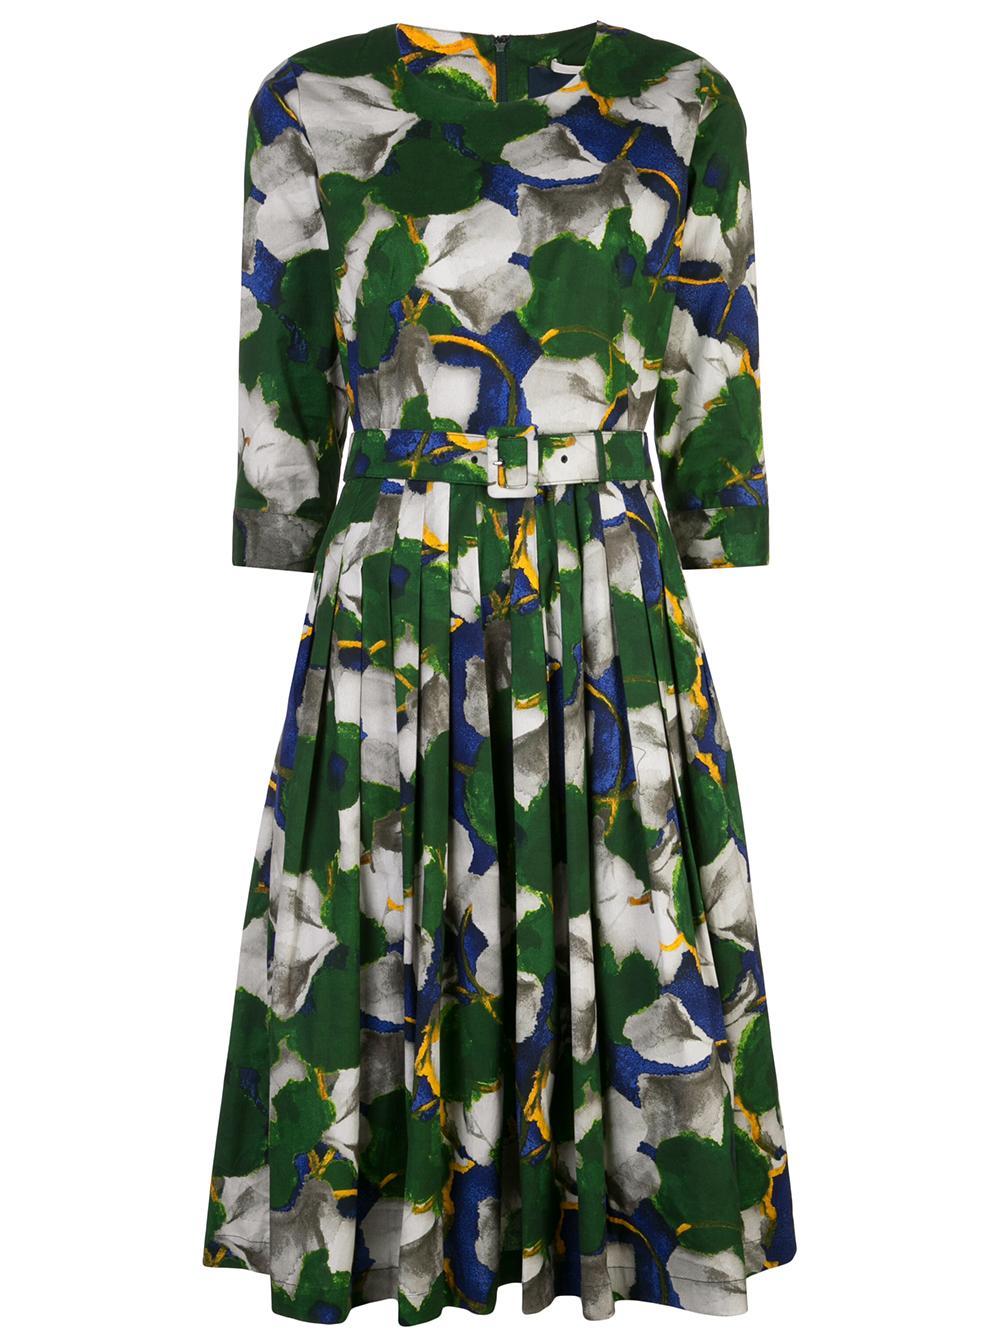 Florance Crew Neck 3/4 Sleeve Dress